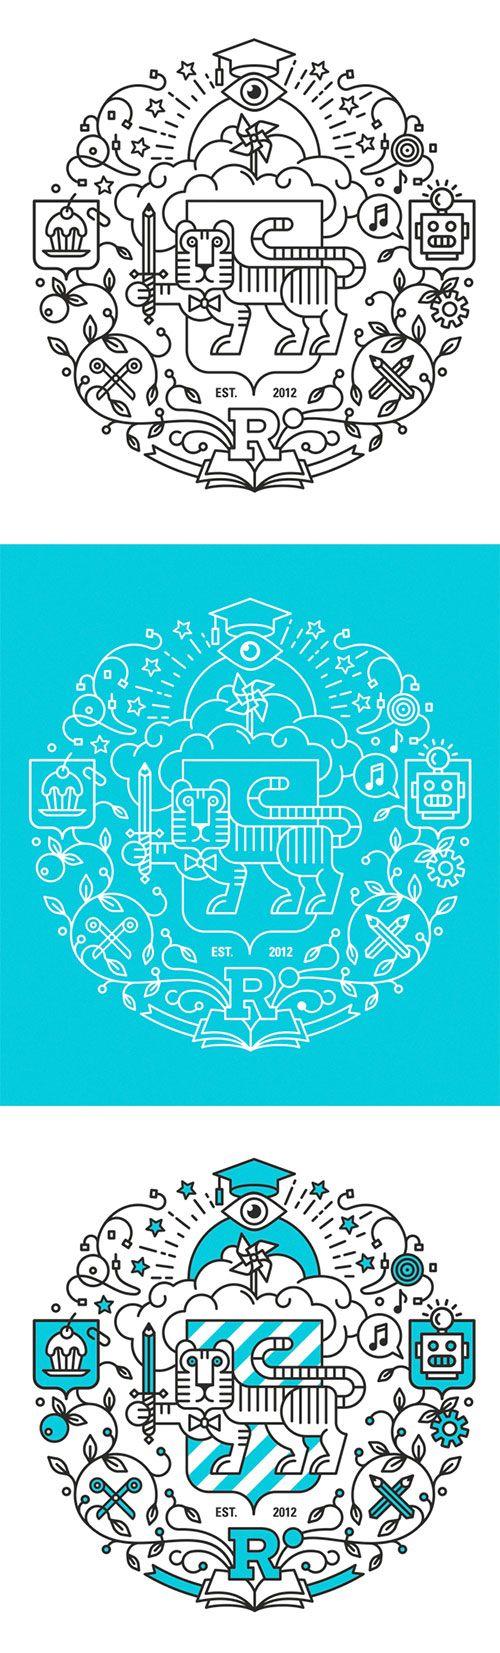 Respublica University emblem